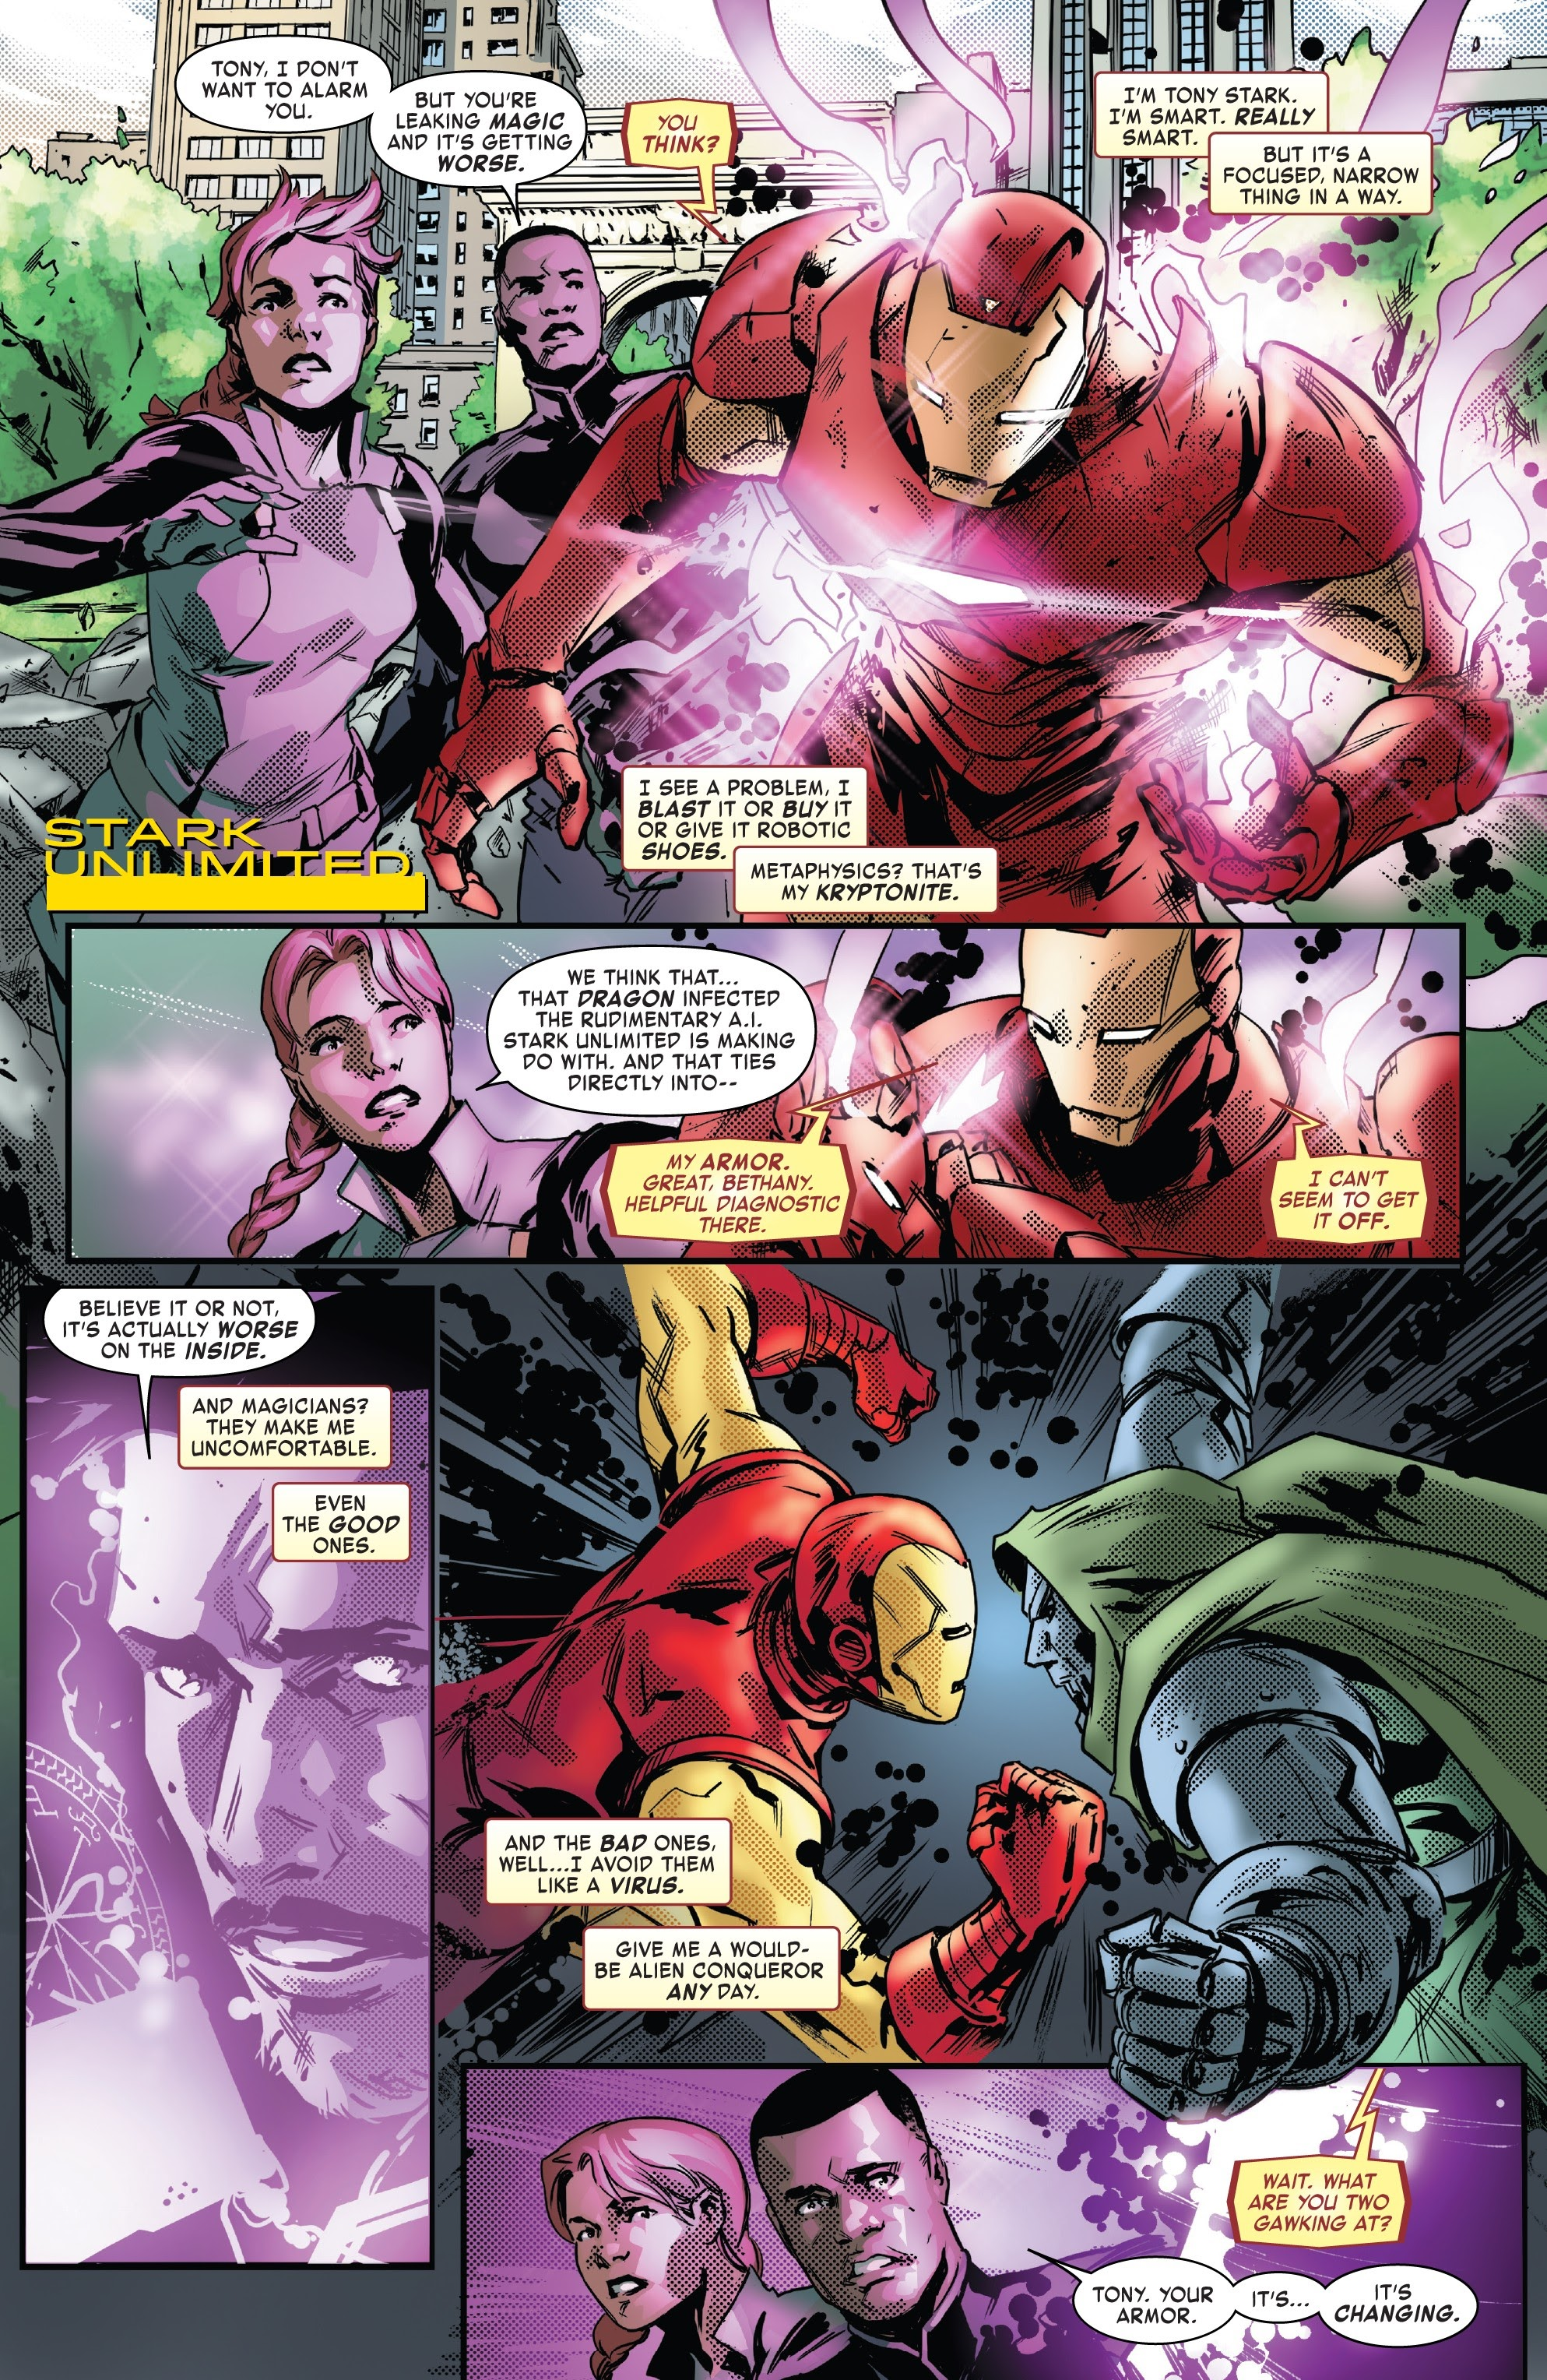 Read online Tony Stark: Iron Man comic -  Issue #13 - 6